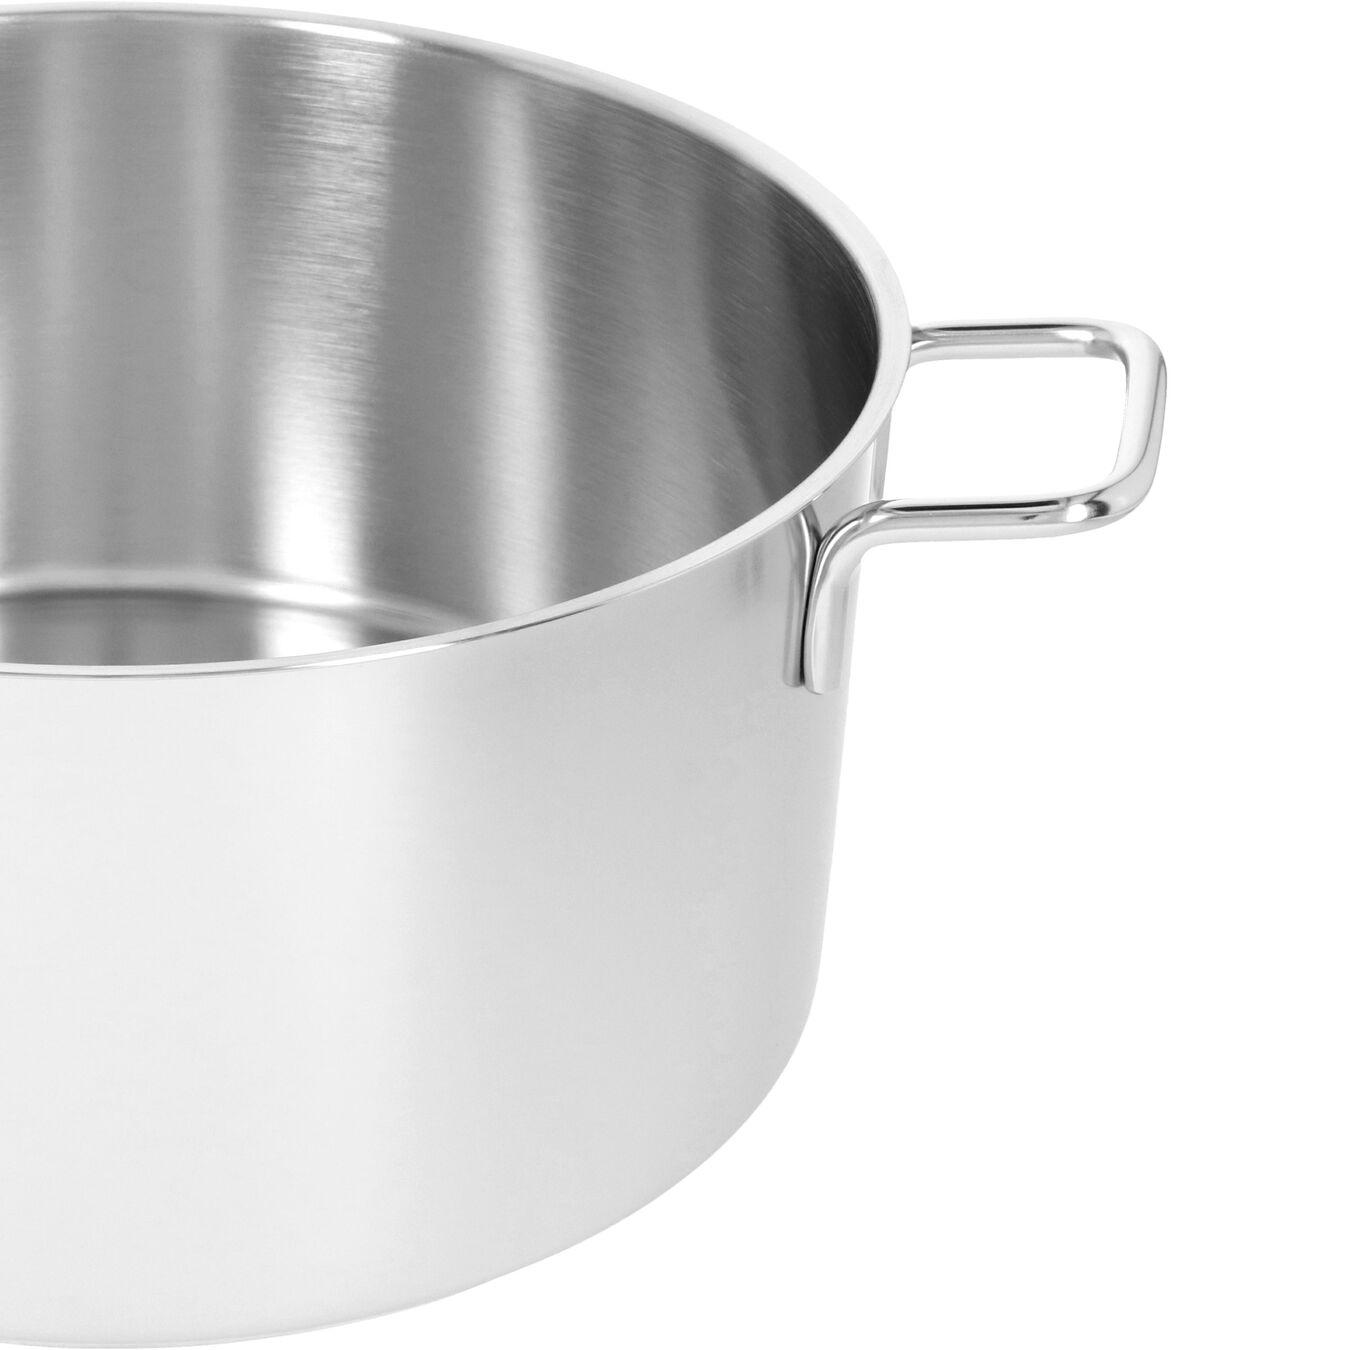 Kookpot met deksel 28 cm / 8,4 l,,large 6